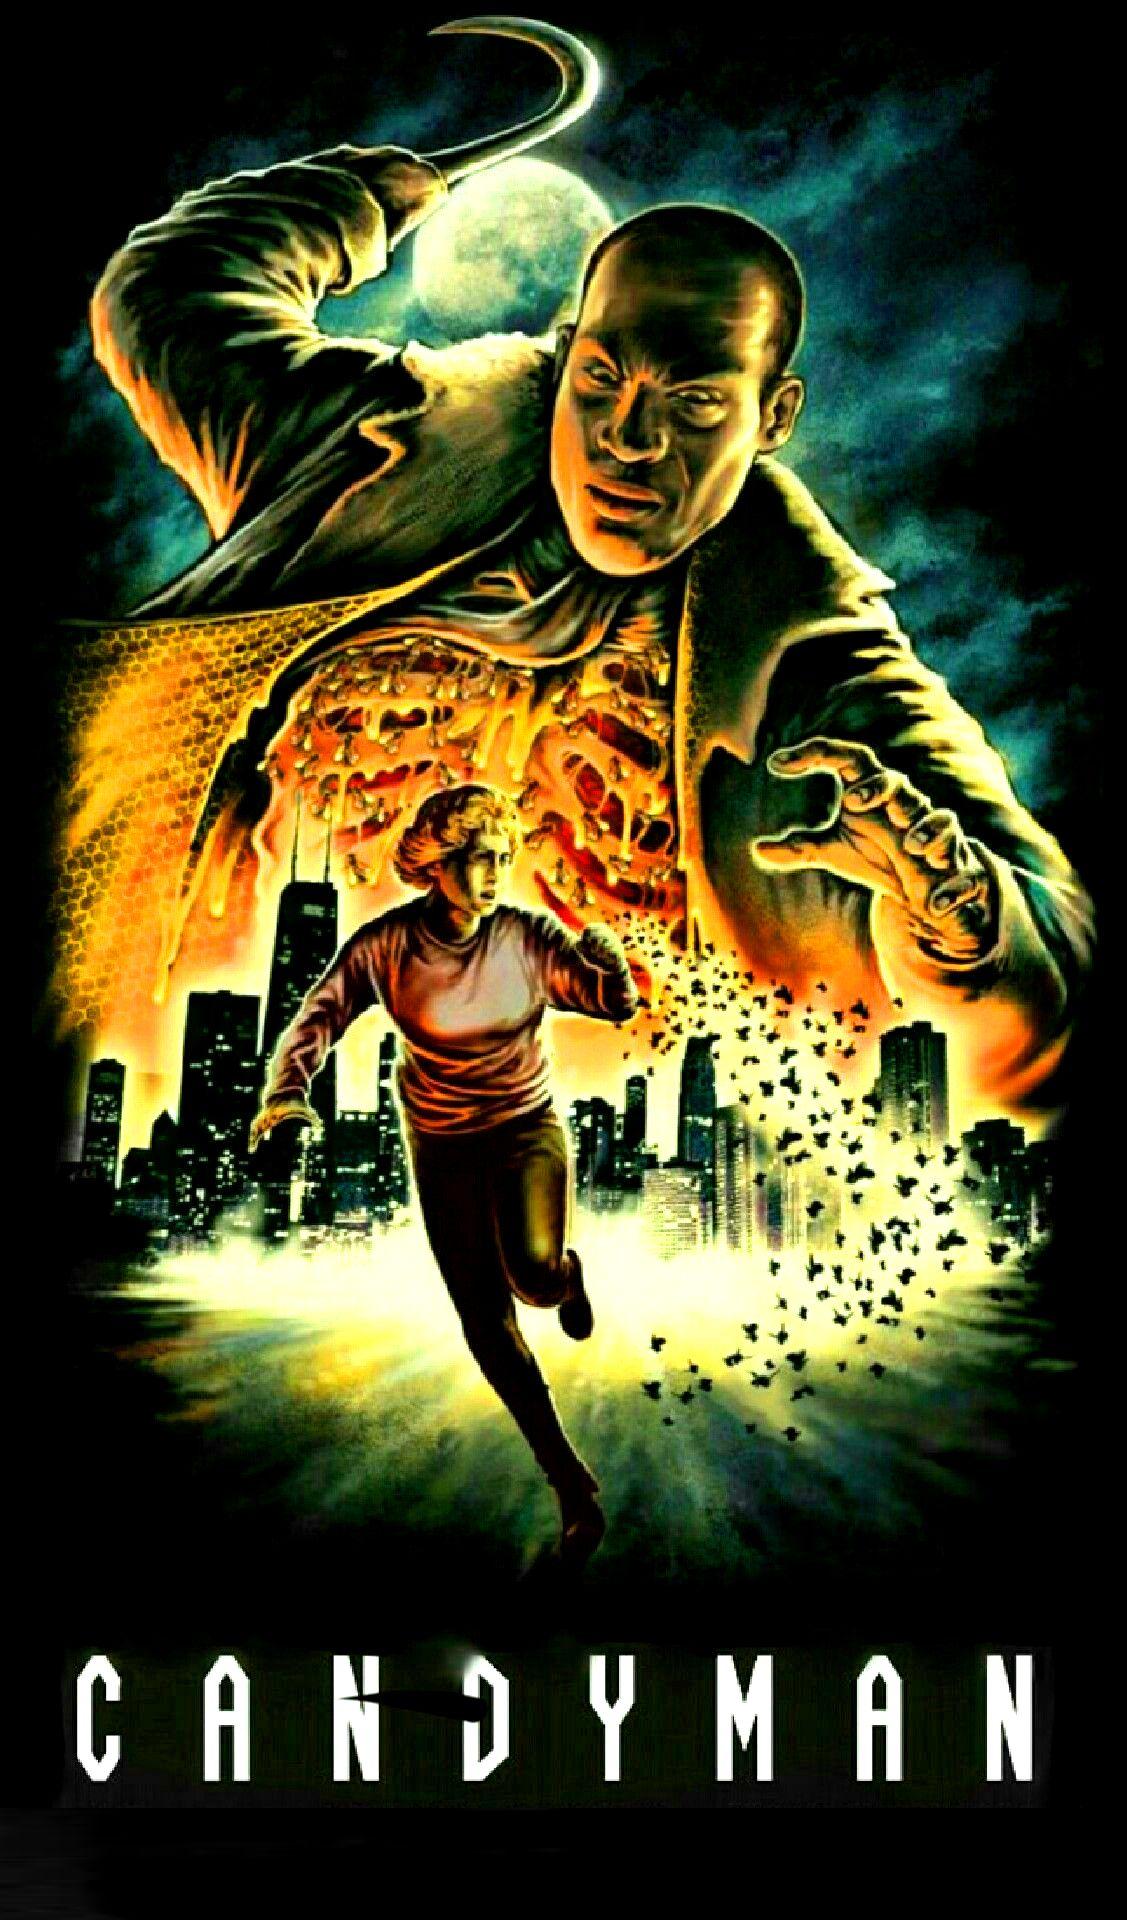 Pin De Casey Billings Em Splatter Slasher Movies Filmes De Terror Cartazes De Filmes Minimalistas Cartazes De Filmes De Terror